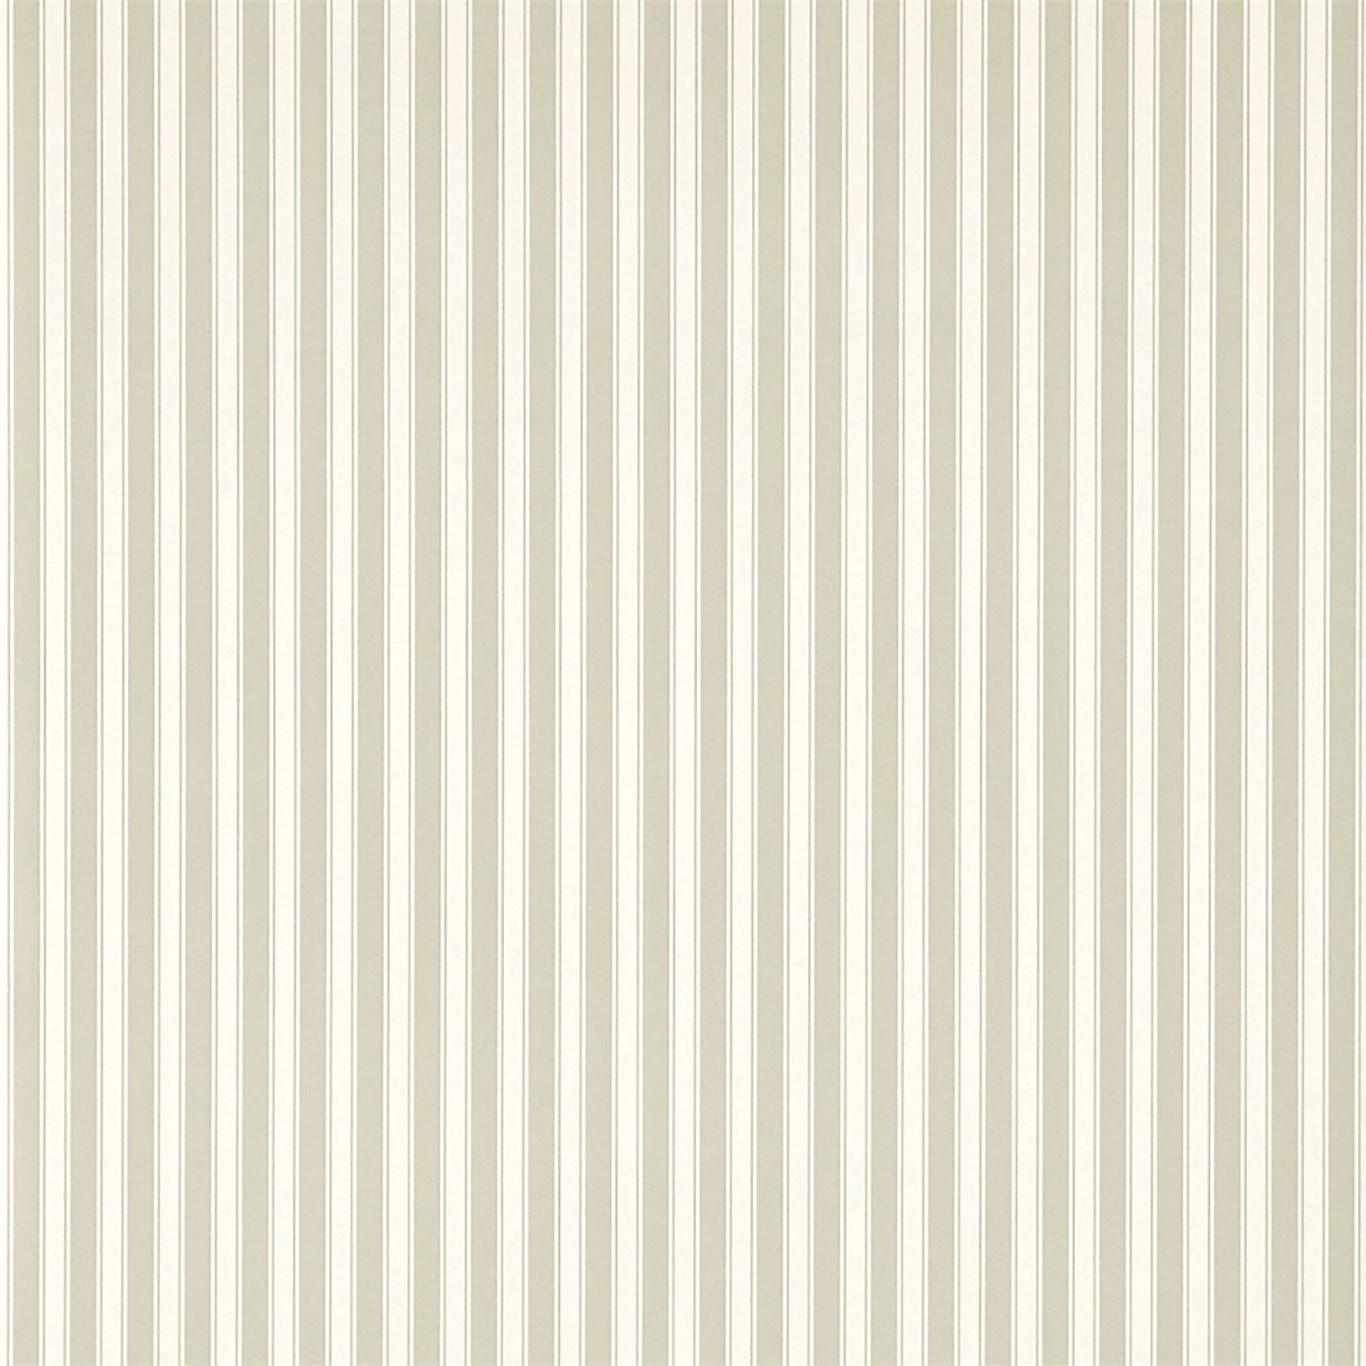 New Tiger Stripe by SAN